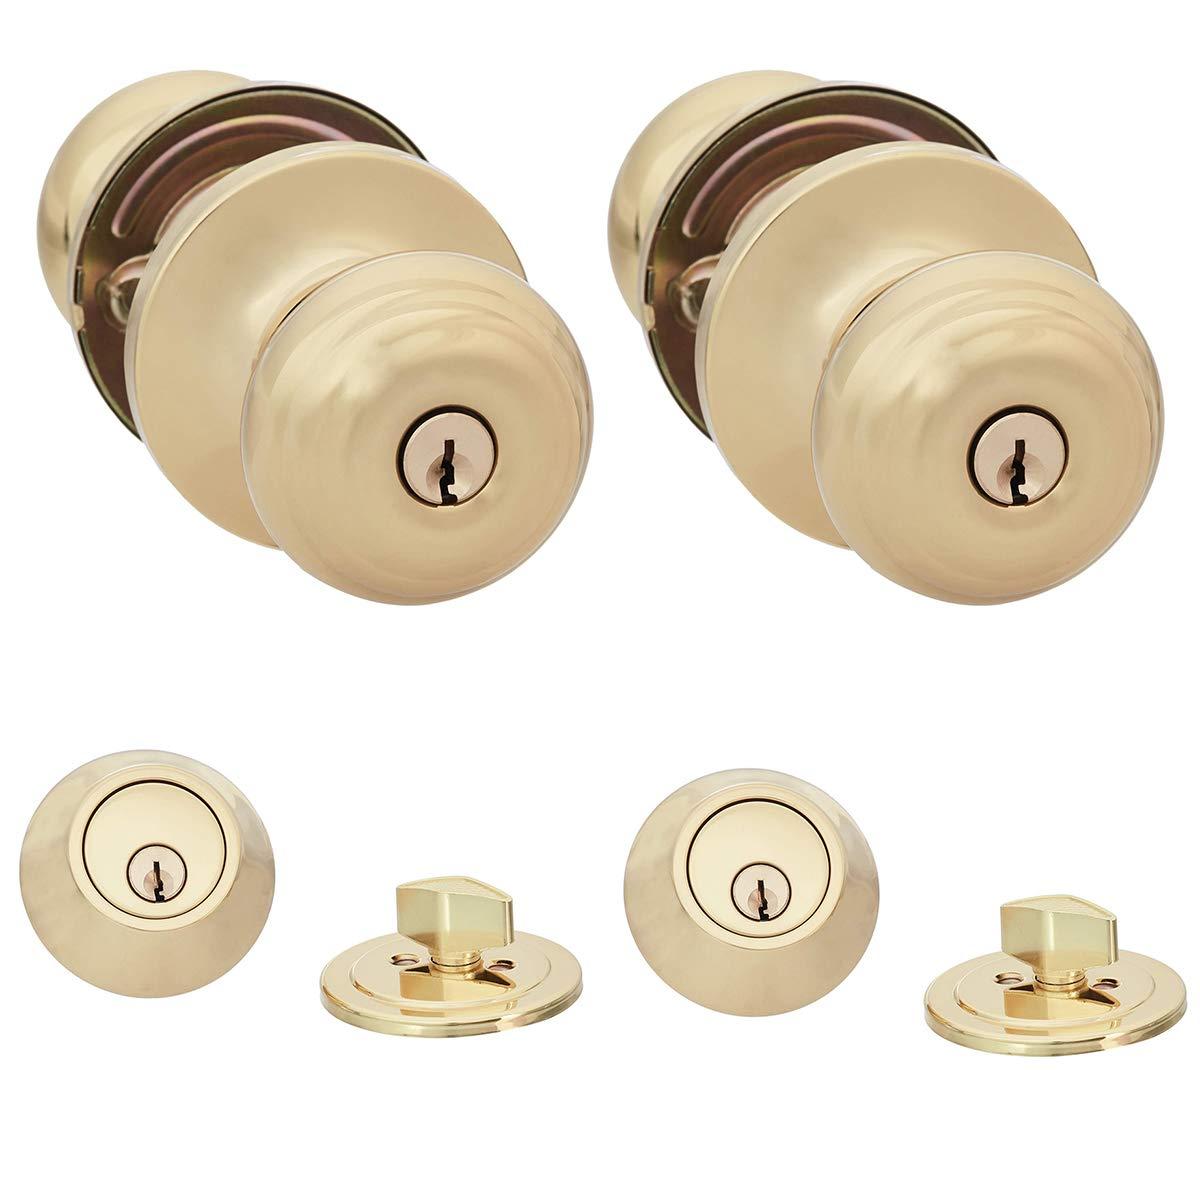 AmazonBasics Entry Knob and Deadbolt - Classic - Polished Brass – 2-Pack by AmazonBasics (Image #1)